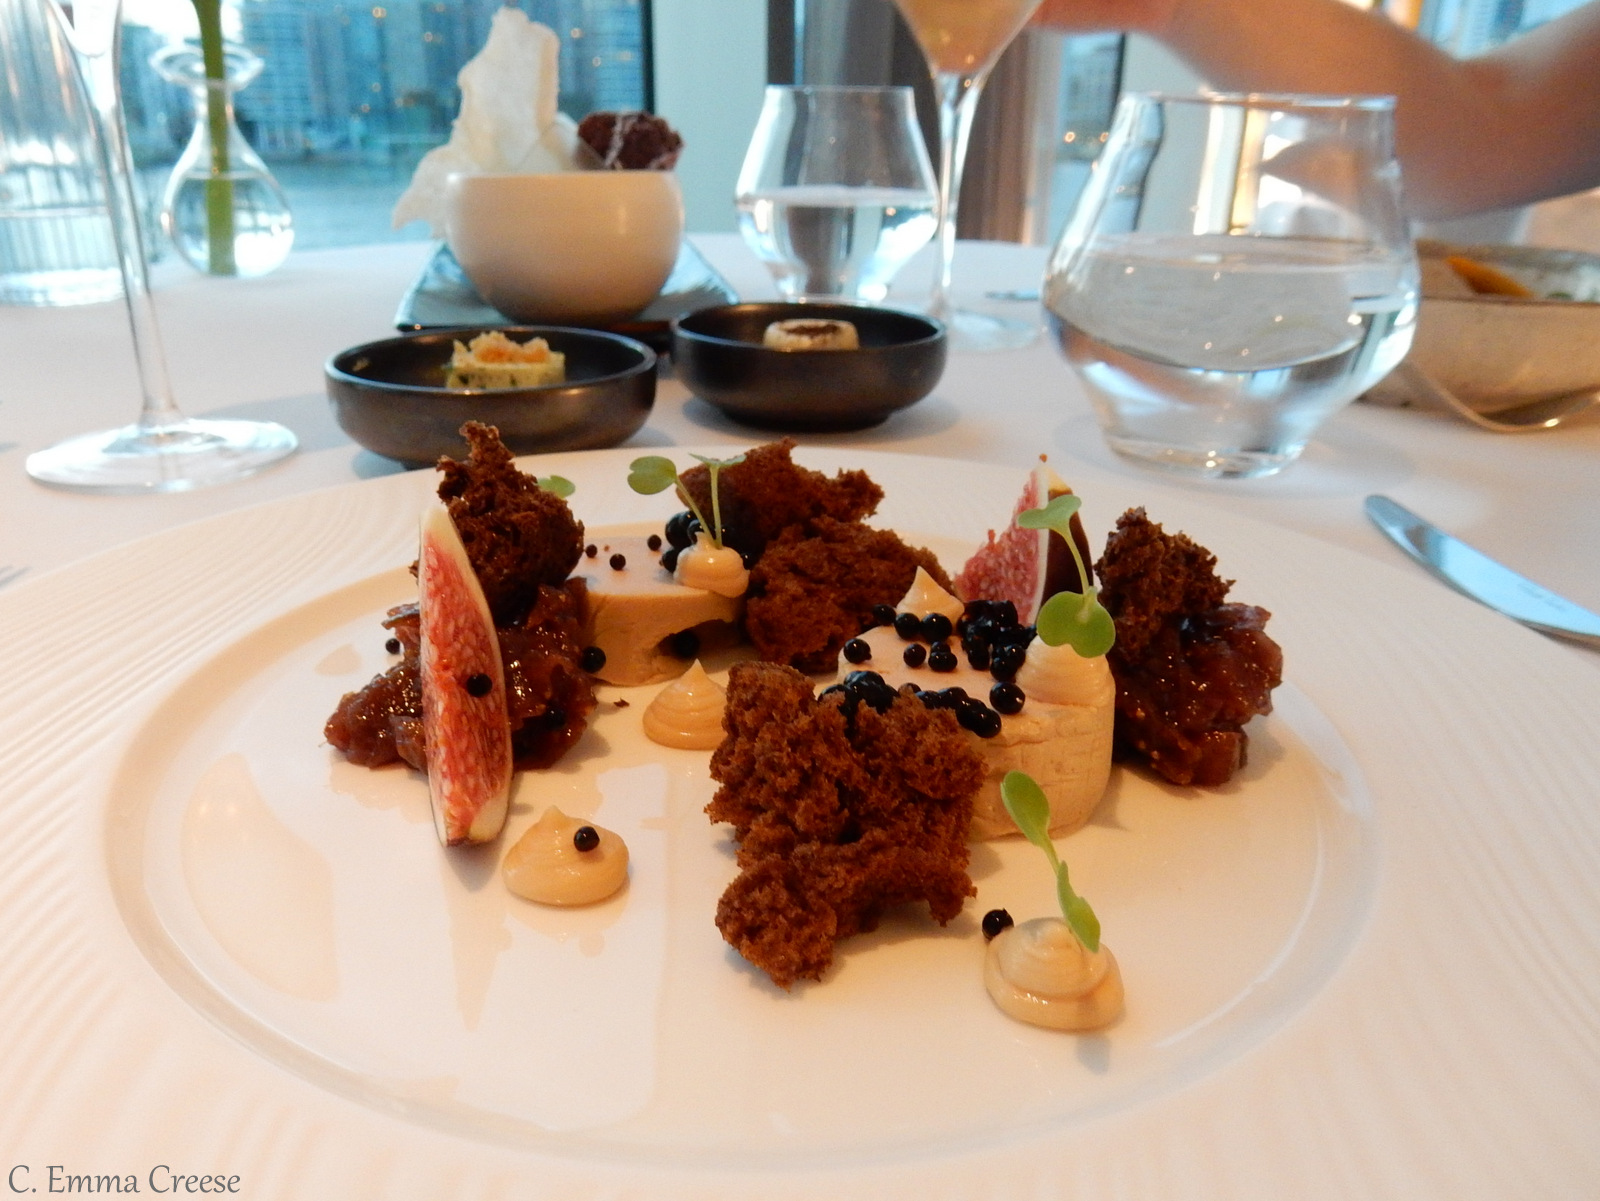 Peninsula Restaurant at the Intercontinental Hotel: Adventures of a London Kiwi